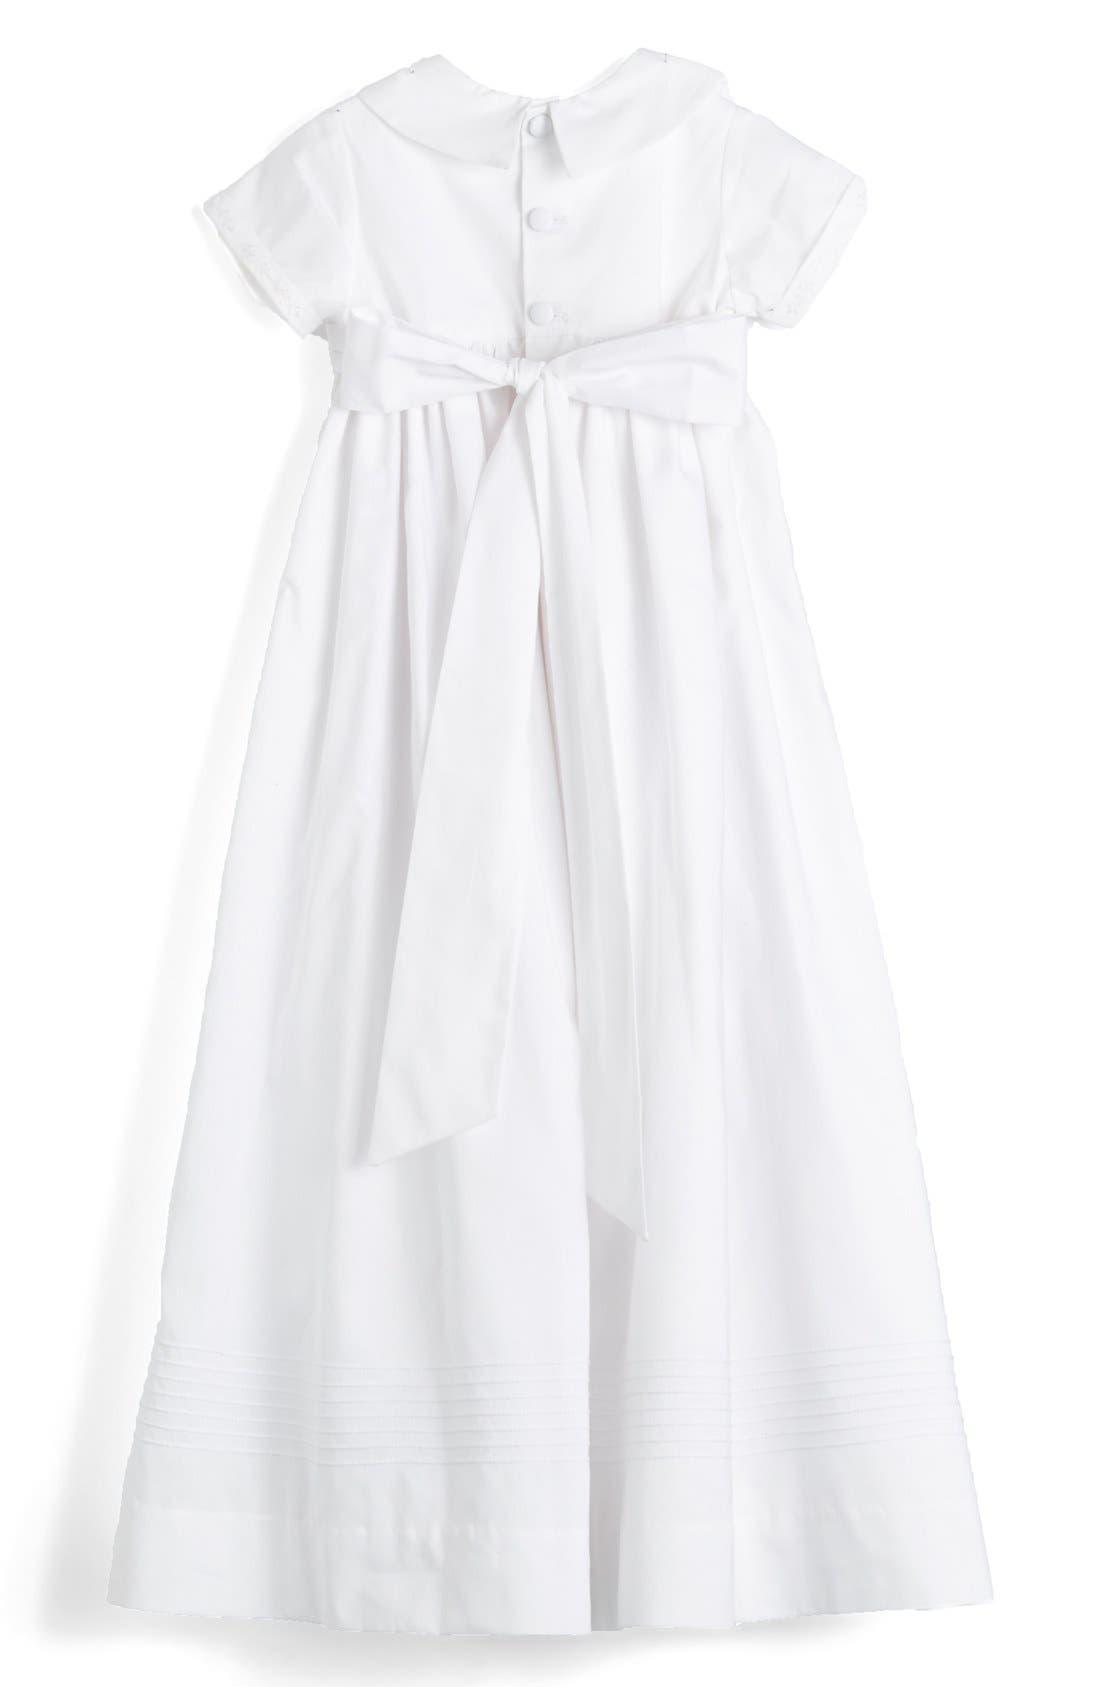 'Classic' Christening Gown & Bonnet,                             Alternate thumbnail 4, color,                             WHITE